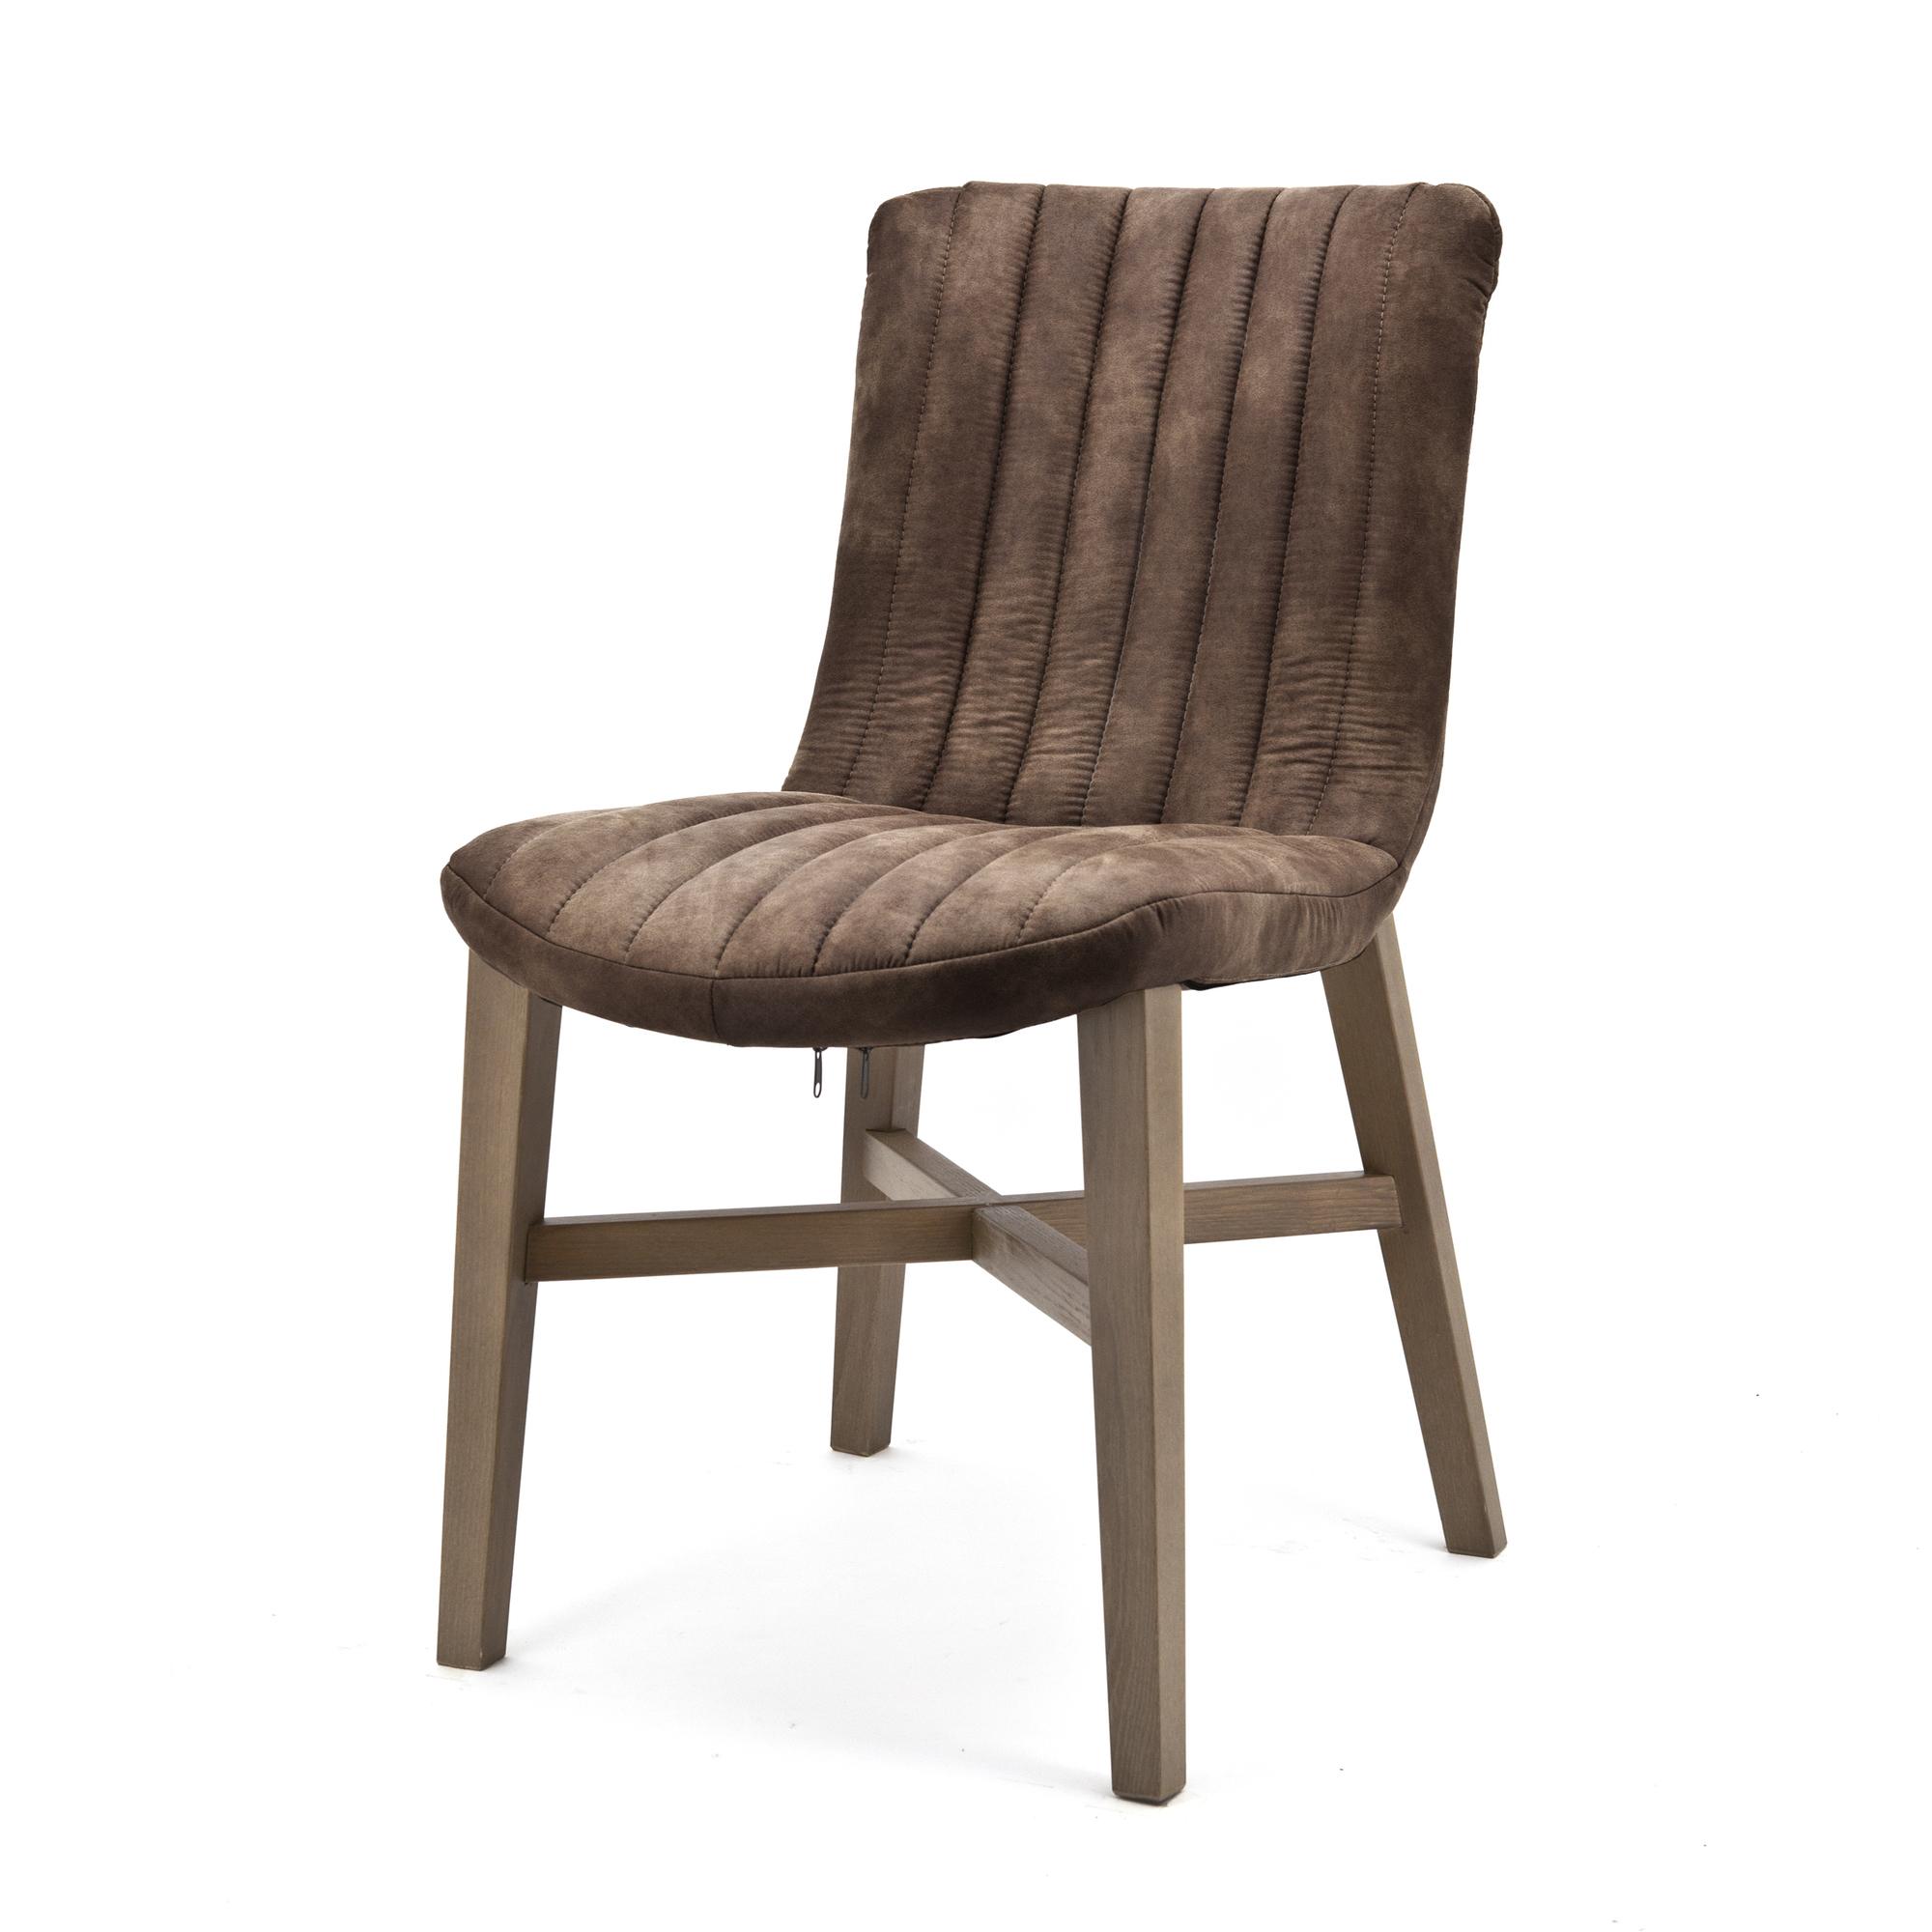 stoel-daisen-eleonora-90183-grijzepoot-bruin